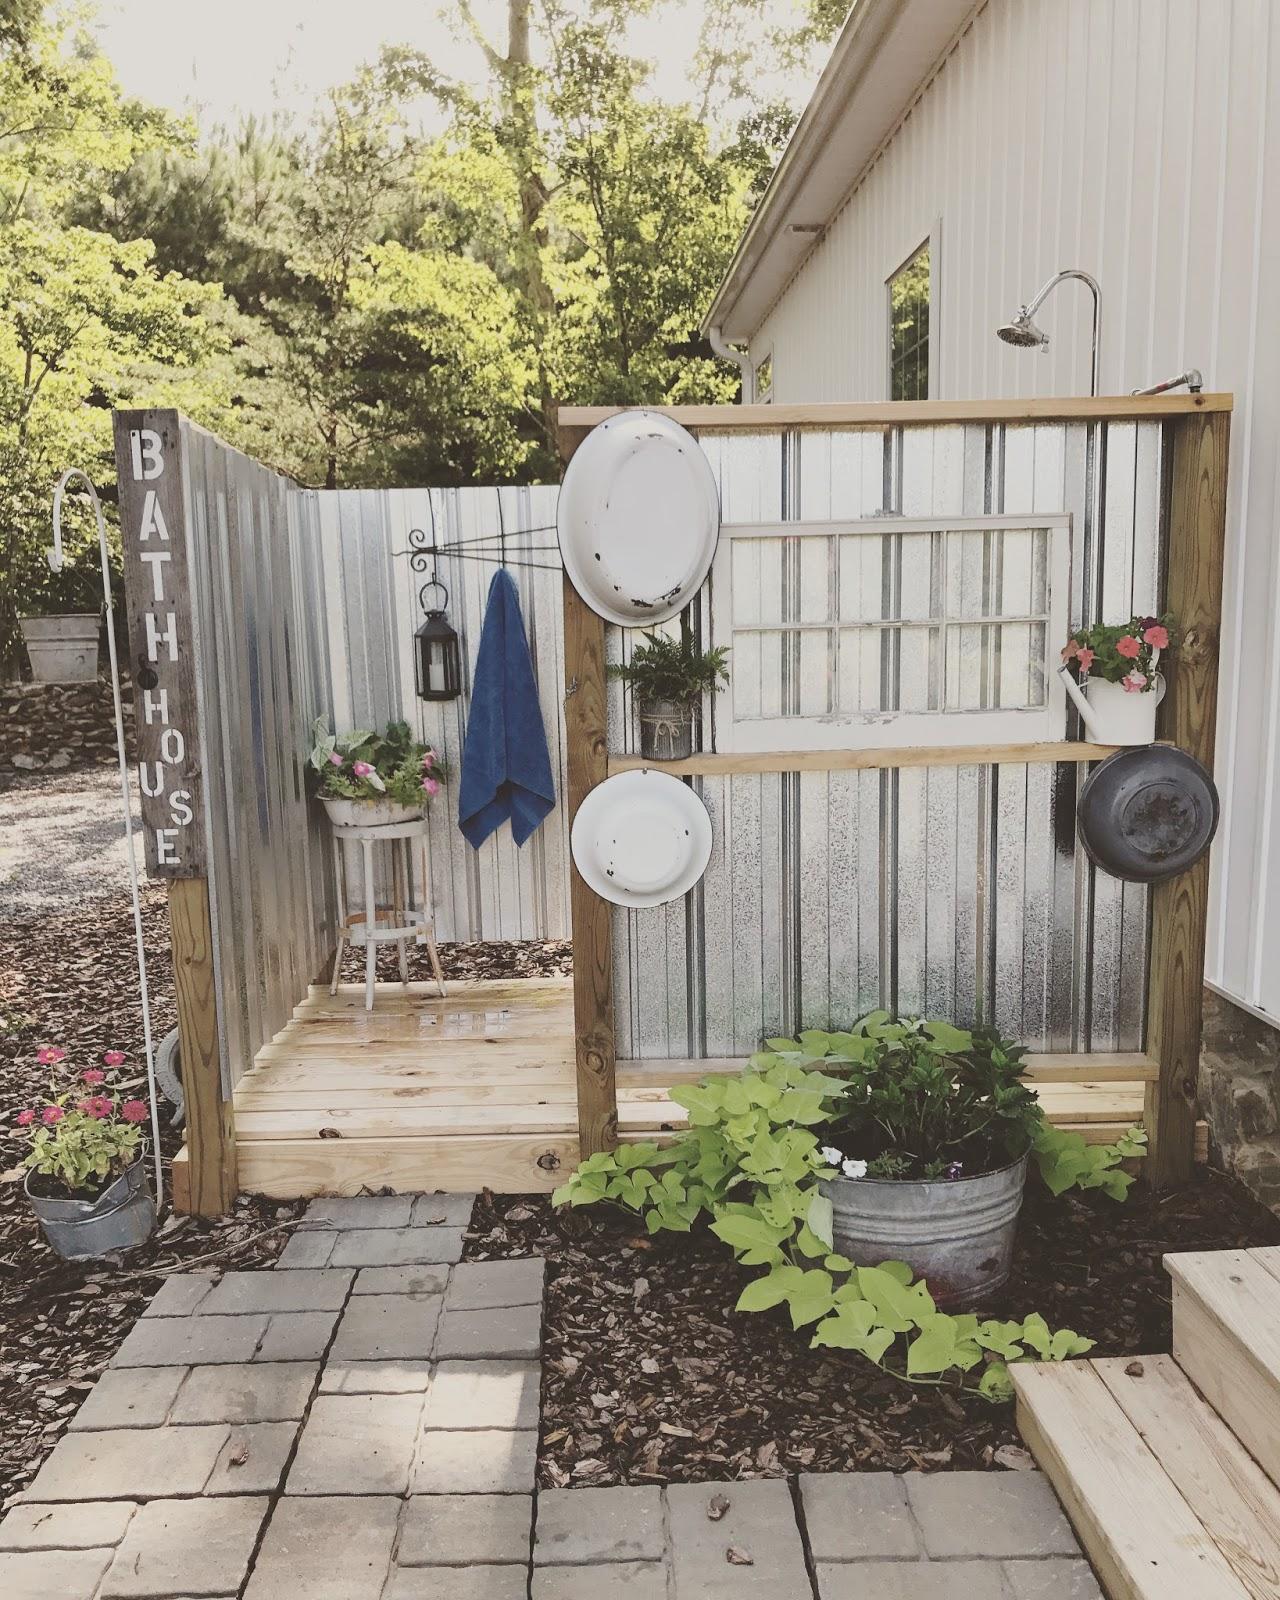 Camping Bathroom Ideas: RaH-Rags Designs: DIY Outdoor Shower